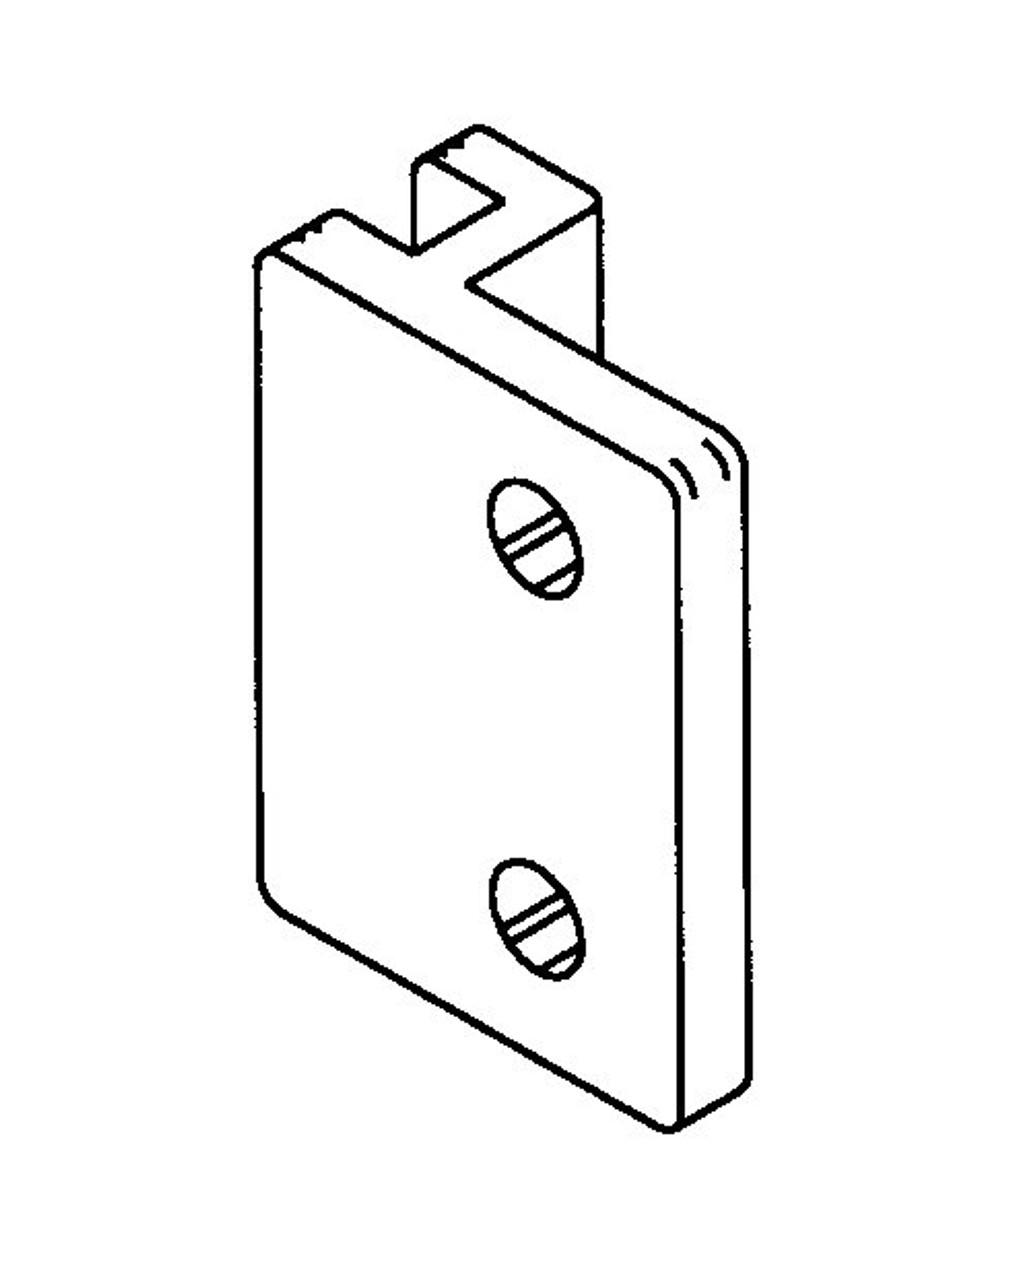 Butcher Boy B12,B14,B16,SA16 & SA20 - Guide Block - BB154R - Right Side